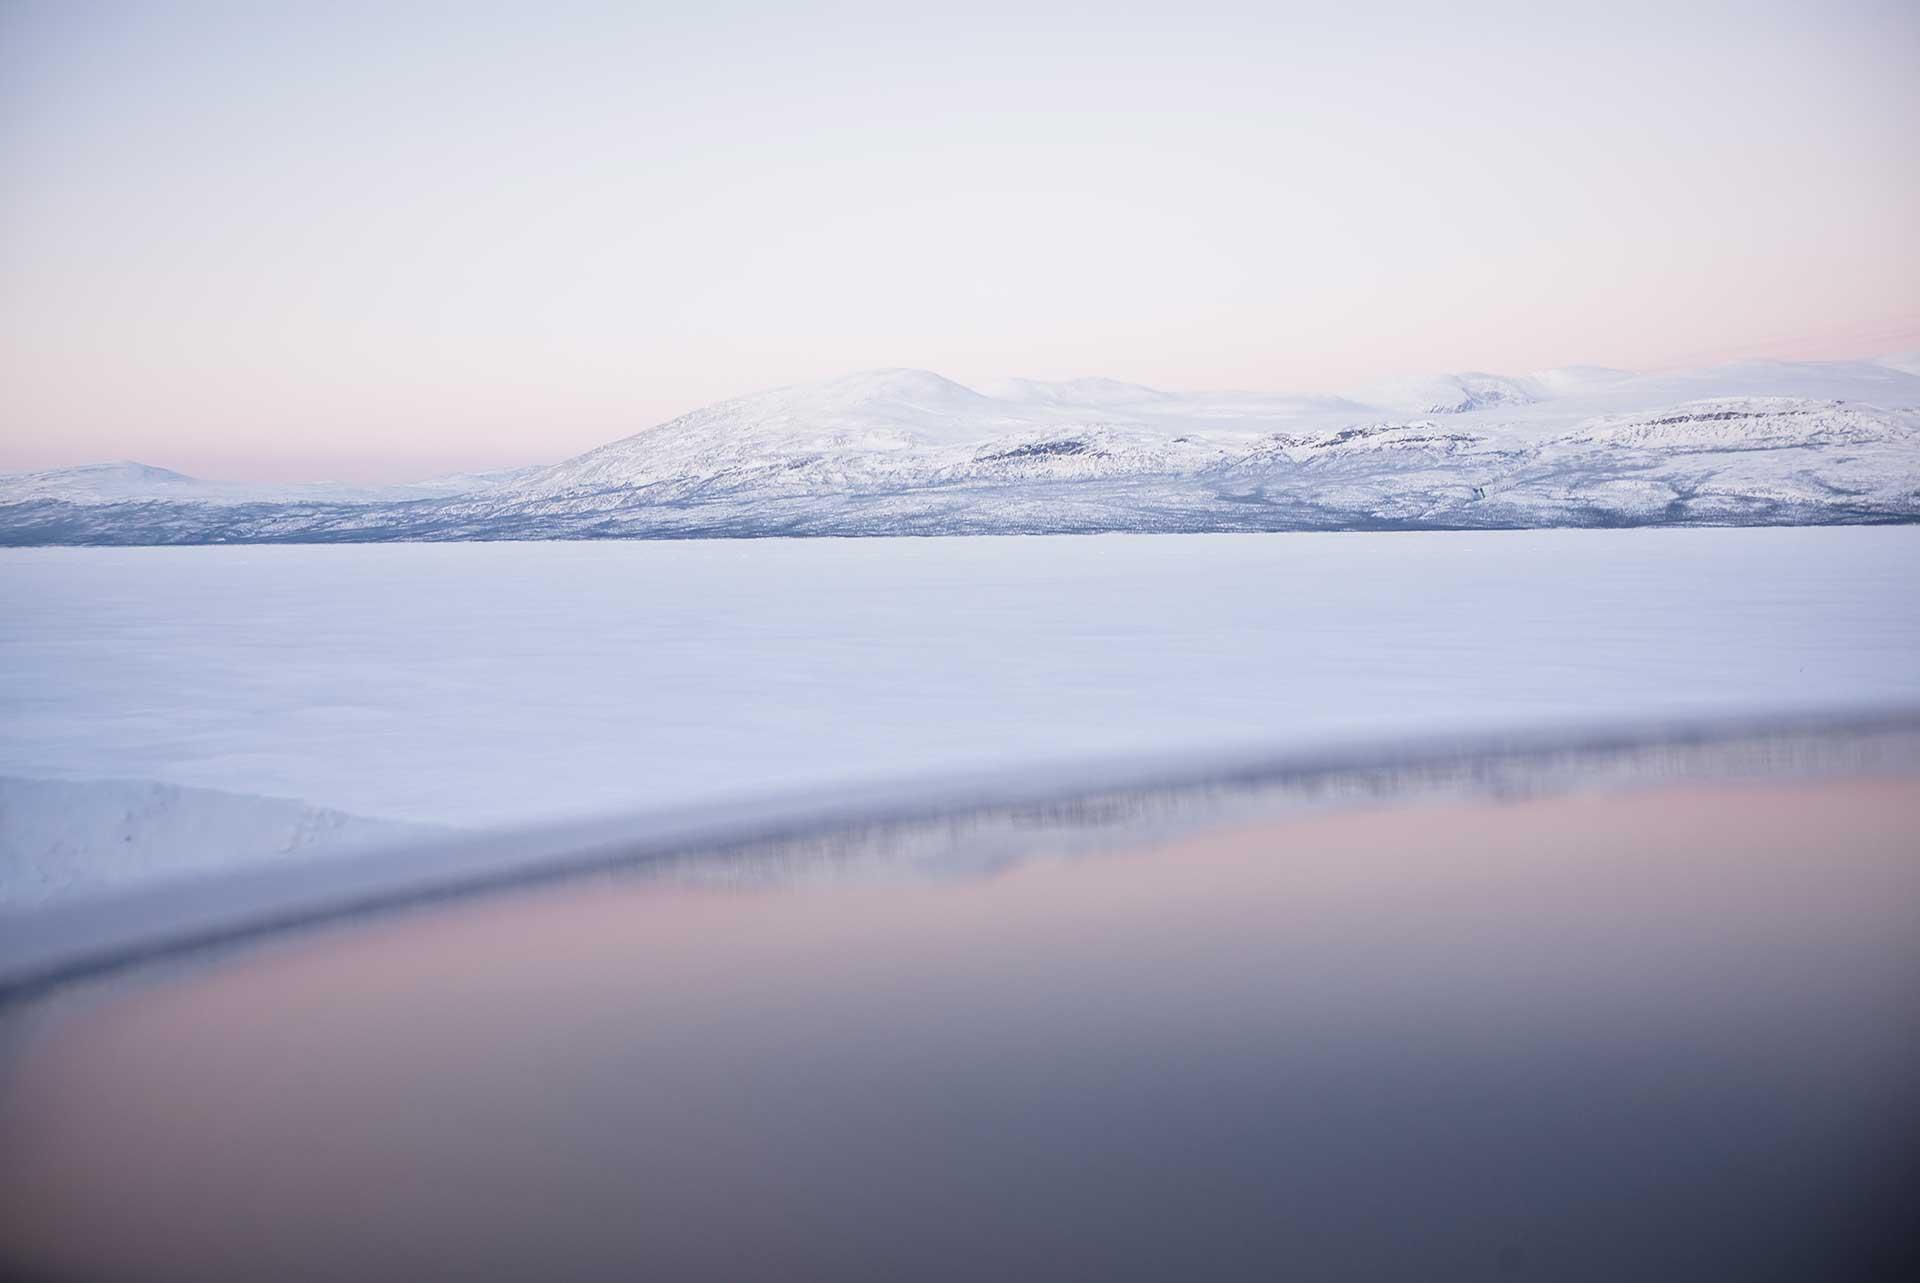 Panorama Landschaft Spiegelung Reisen Fotografie Norwegen Volvo